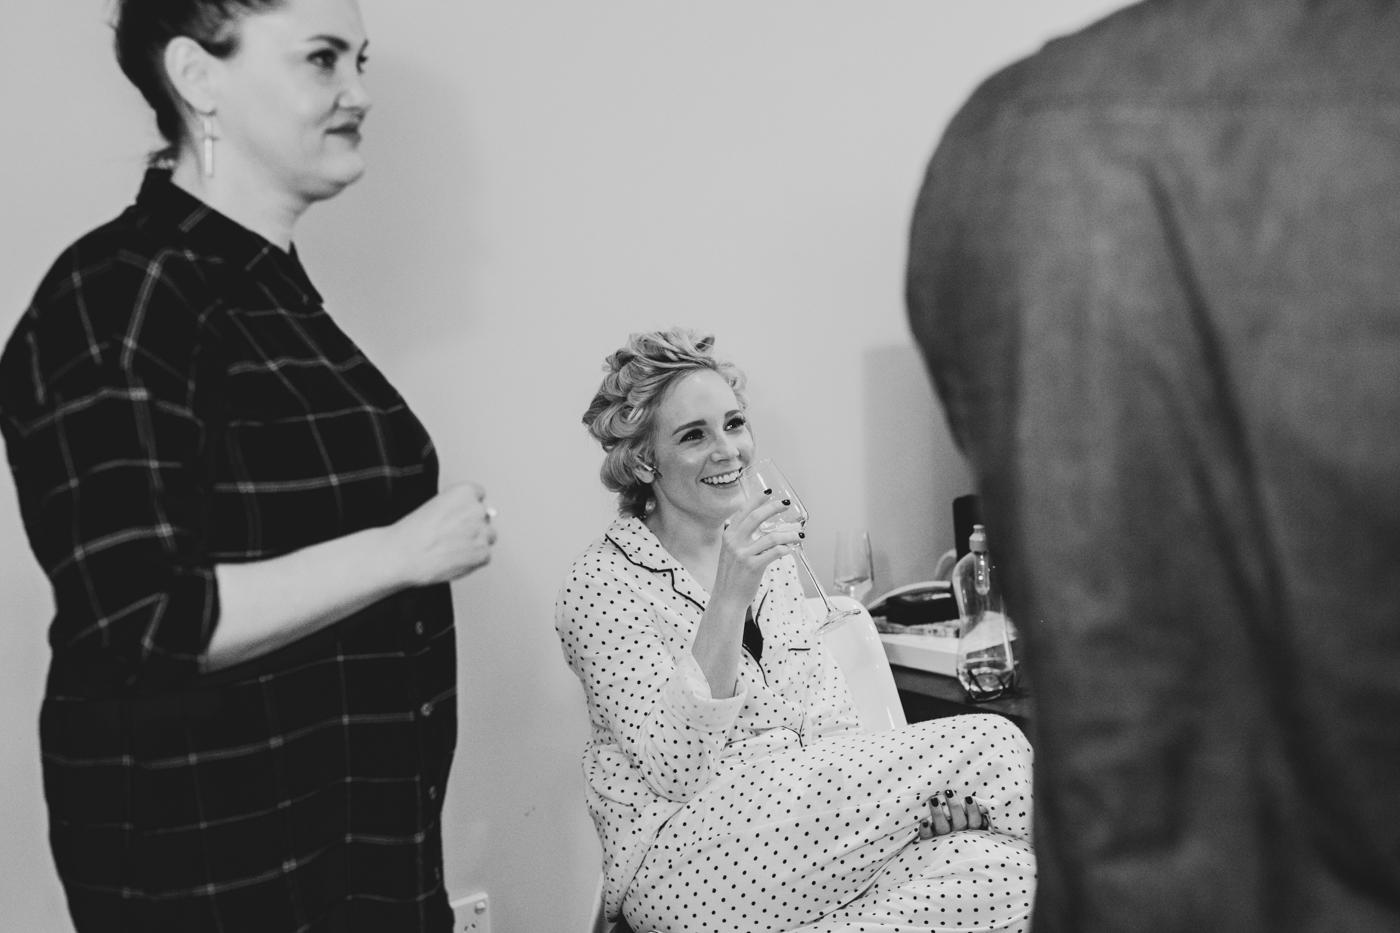 Jo & Tom Wedding - The Grounds of Alexandria - Samantha Heather Photography-47.jpg